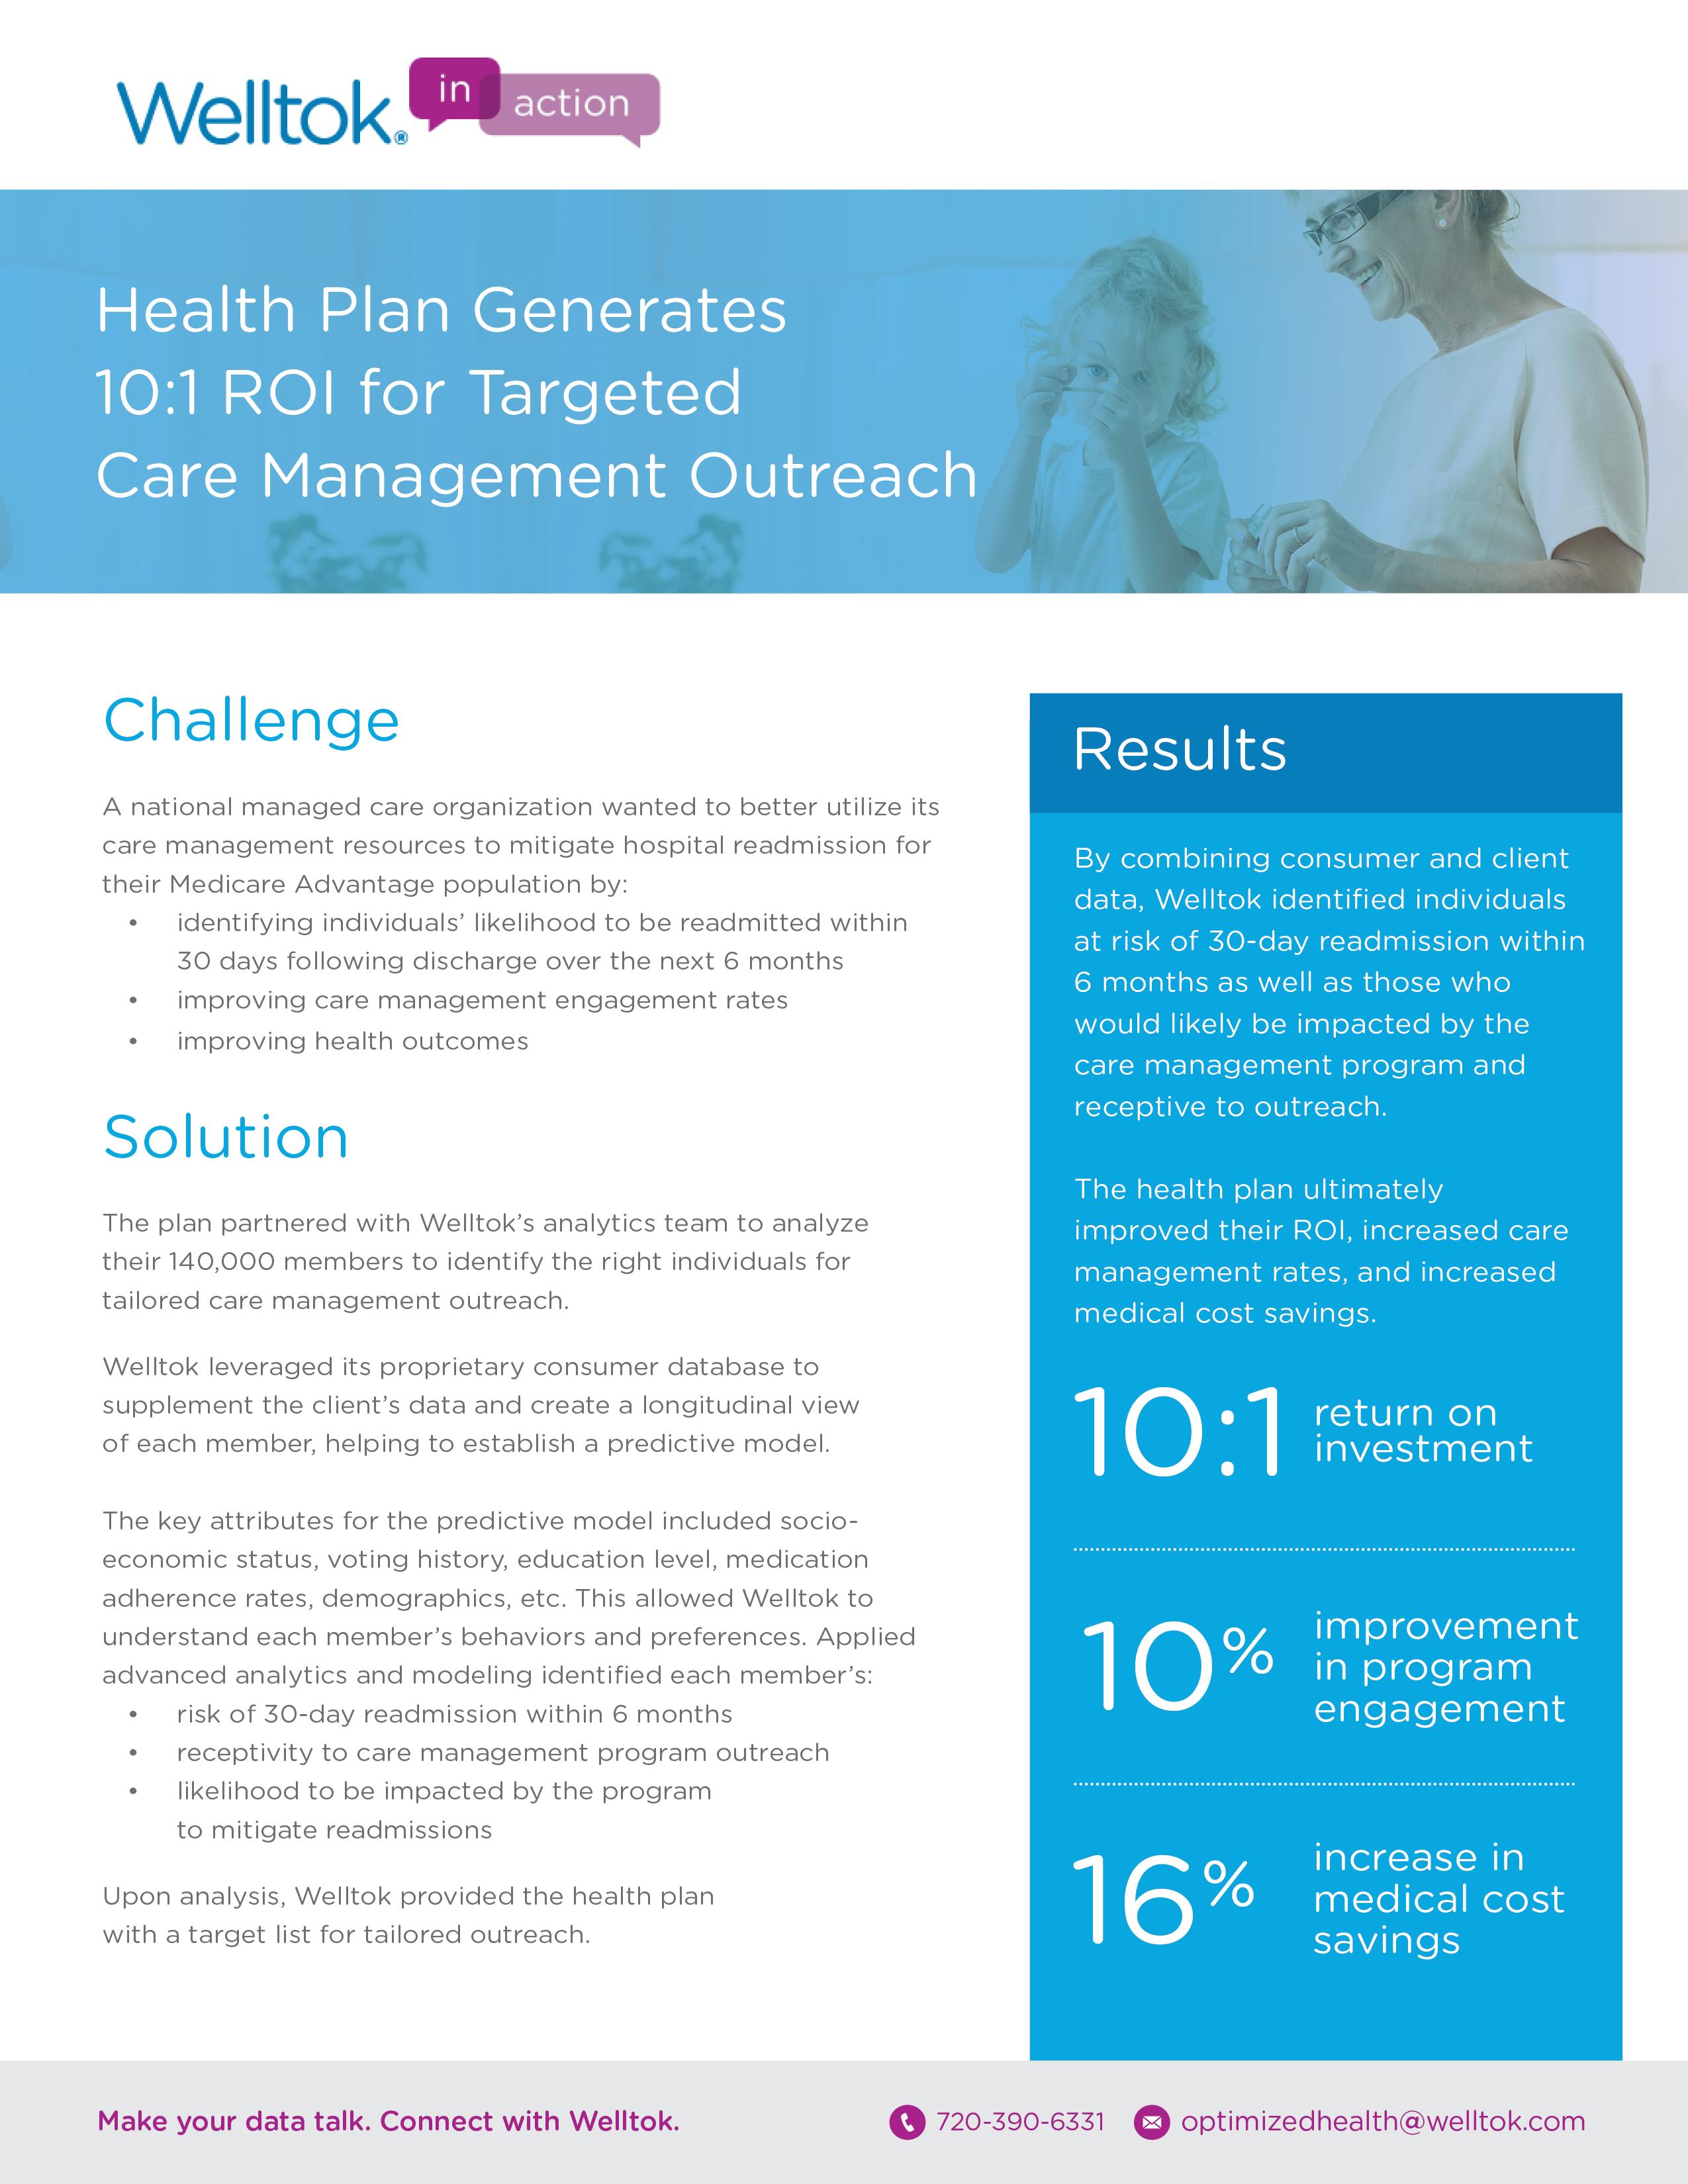 Health Plan Generates 10-1 ROI.png